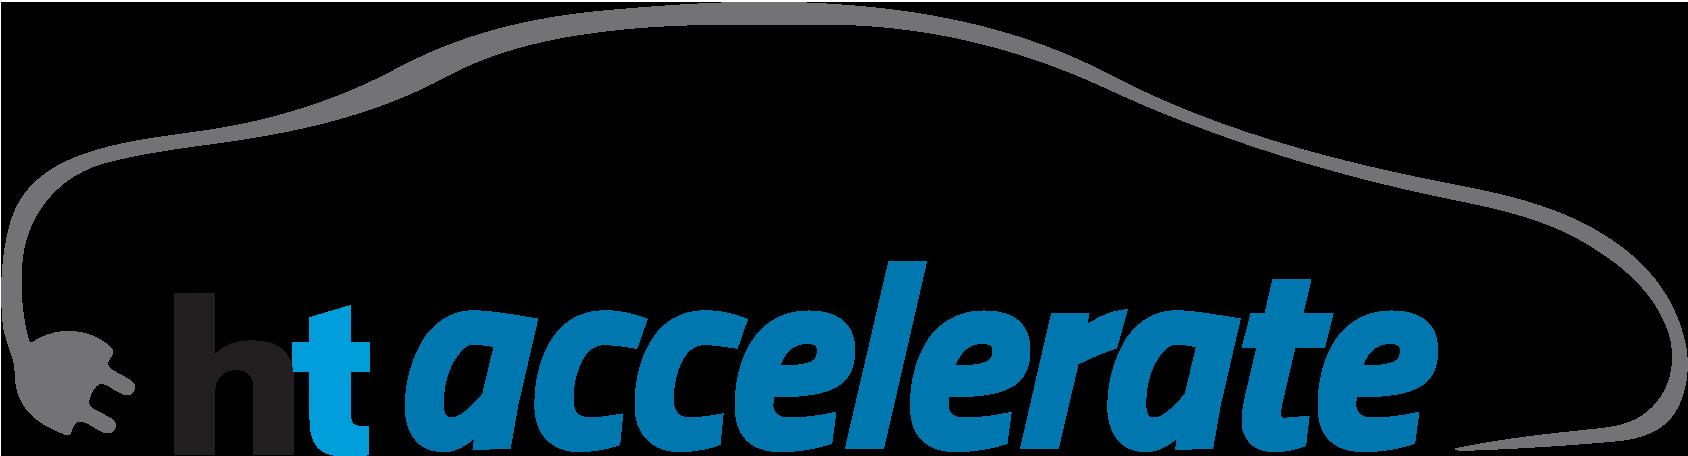 Accerate Logo (1)